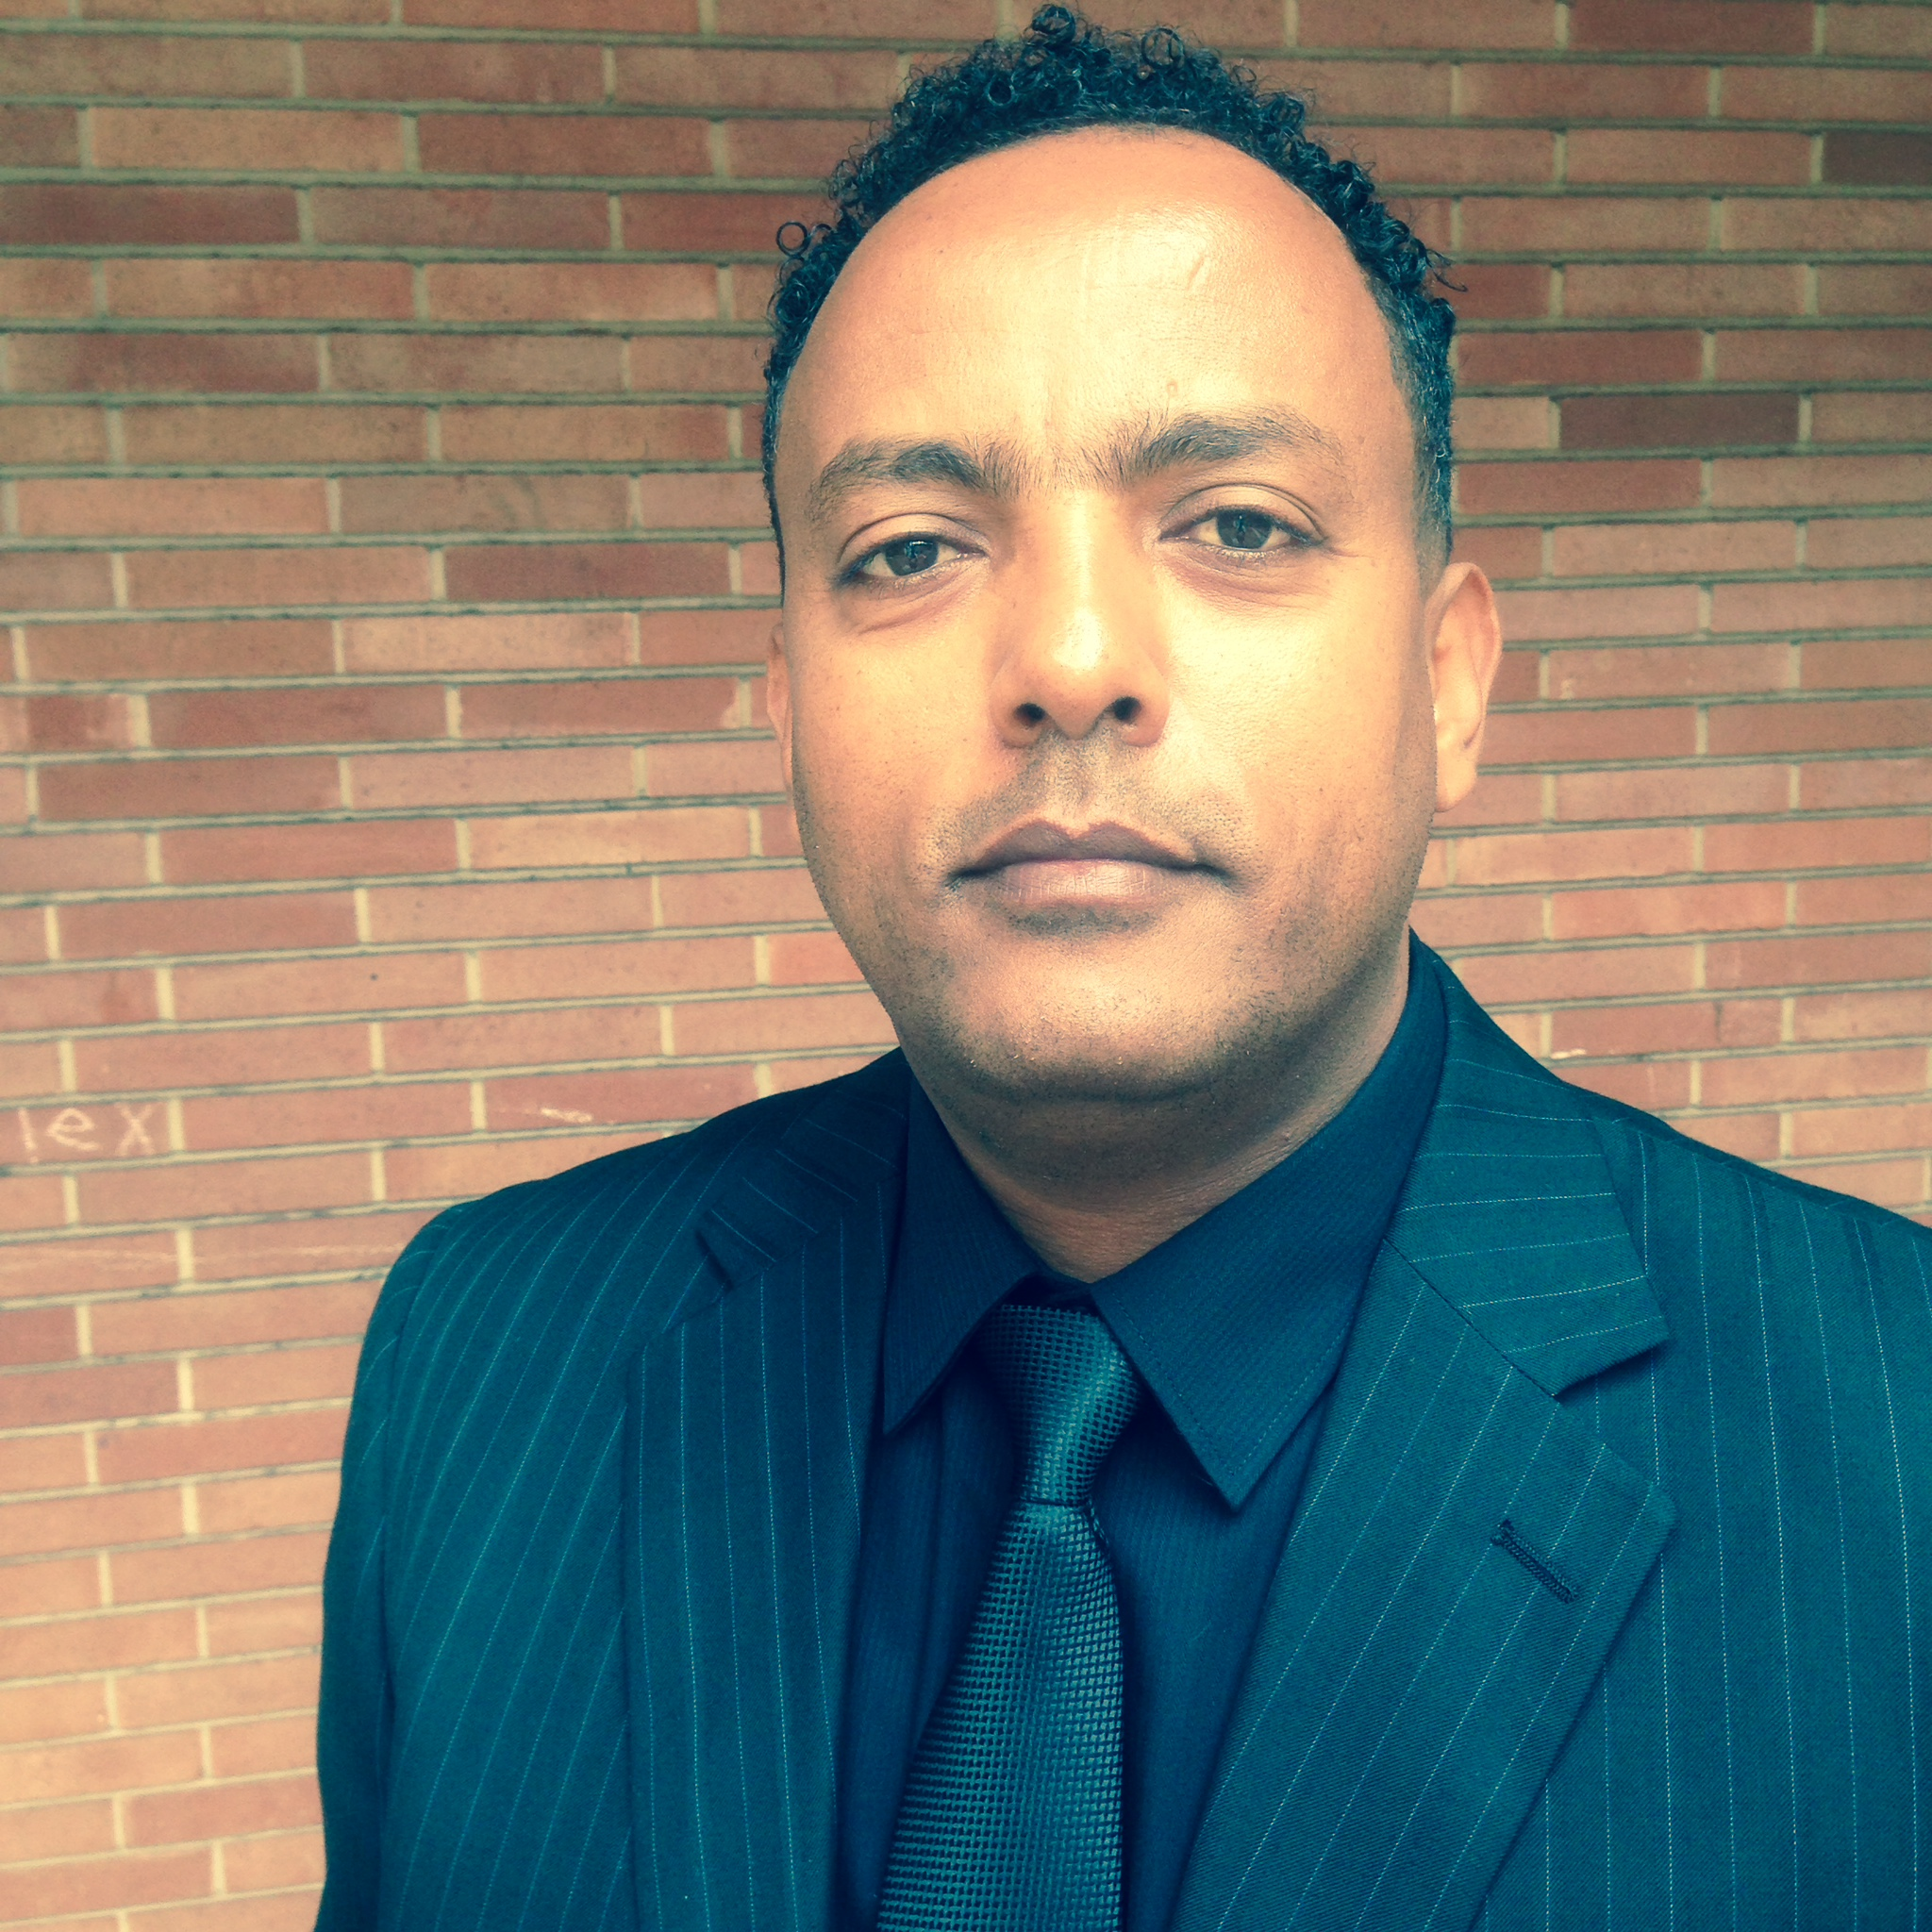 Pastor Michael Wolle Arega